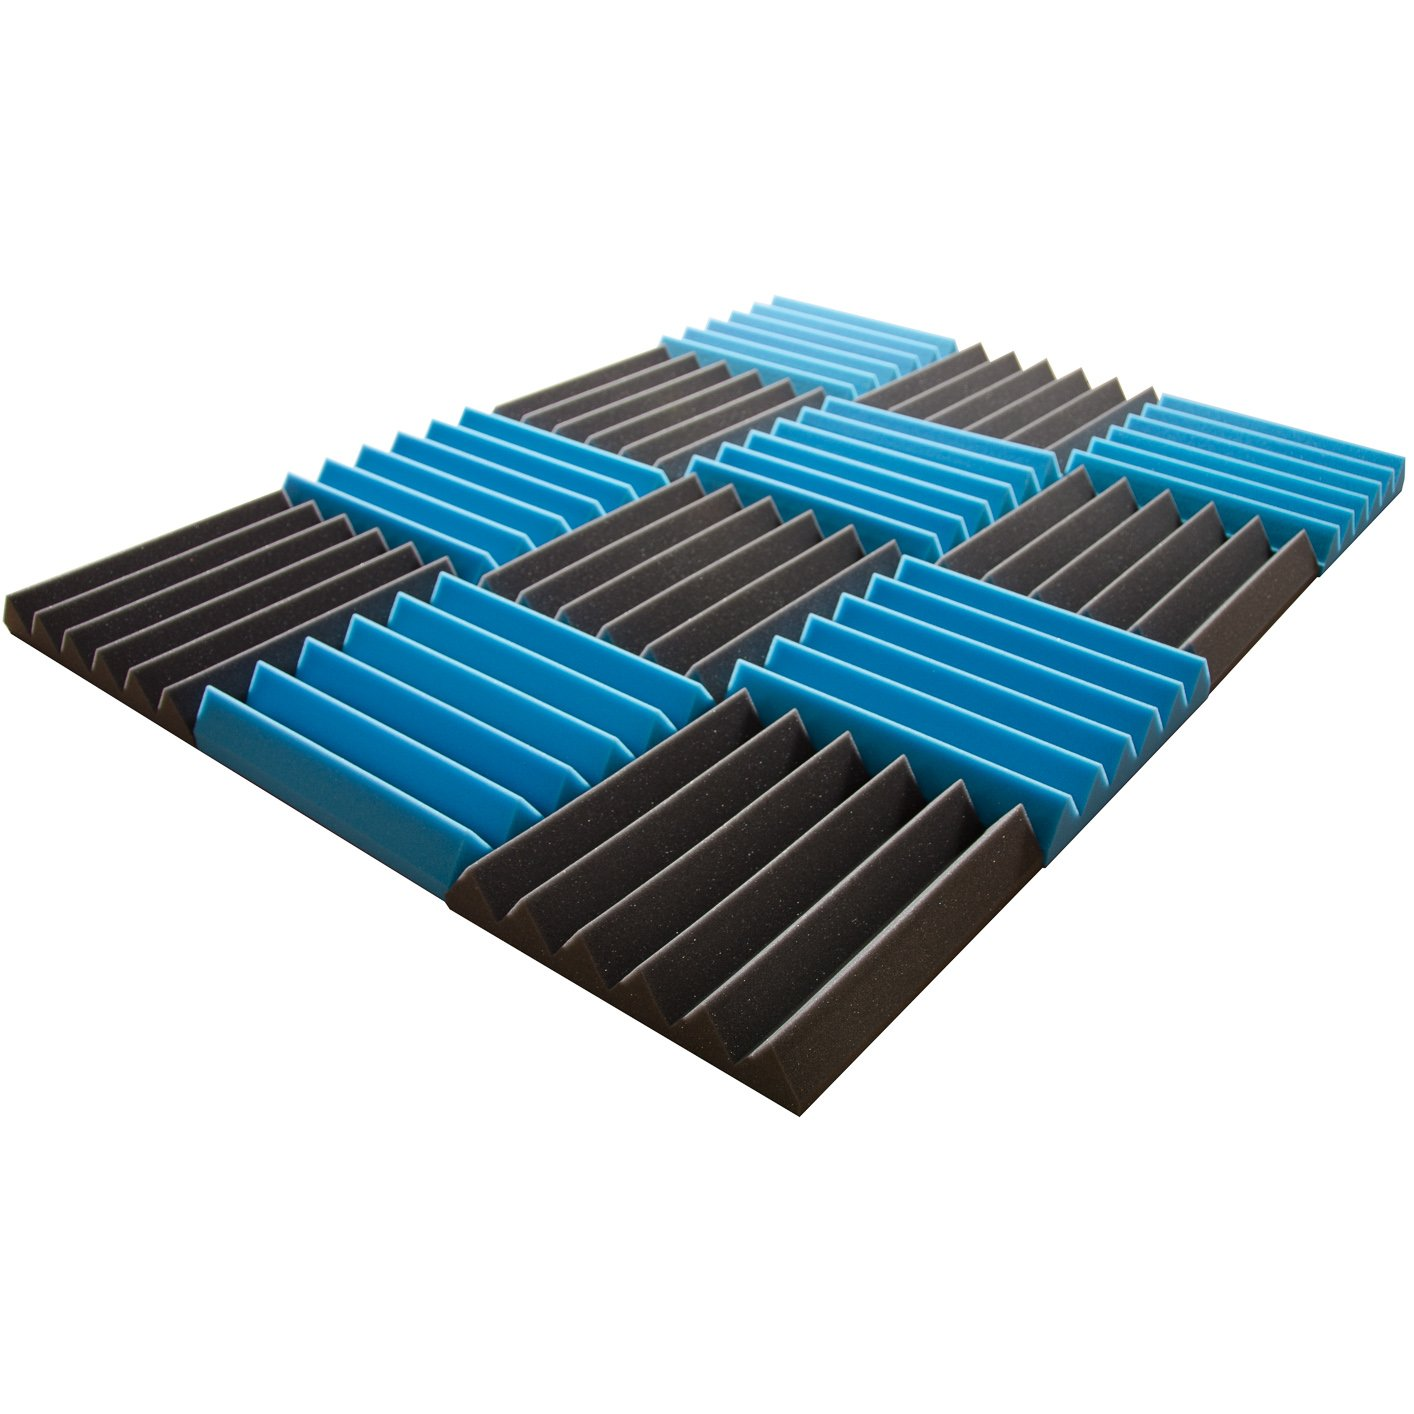 Pro Studio Acoustics - 12''x12''x2'' Acoustic Wedge Foam Absorption Soundproofing Tiles - Blue/Charcoal - 12 Pack by Pro Studio Acoustics (Image #2)